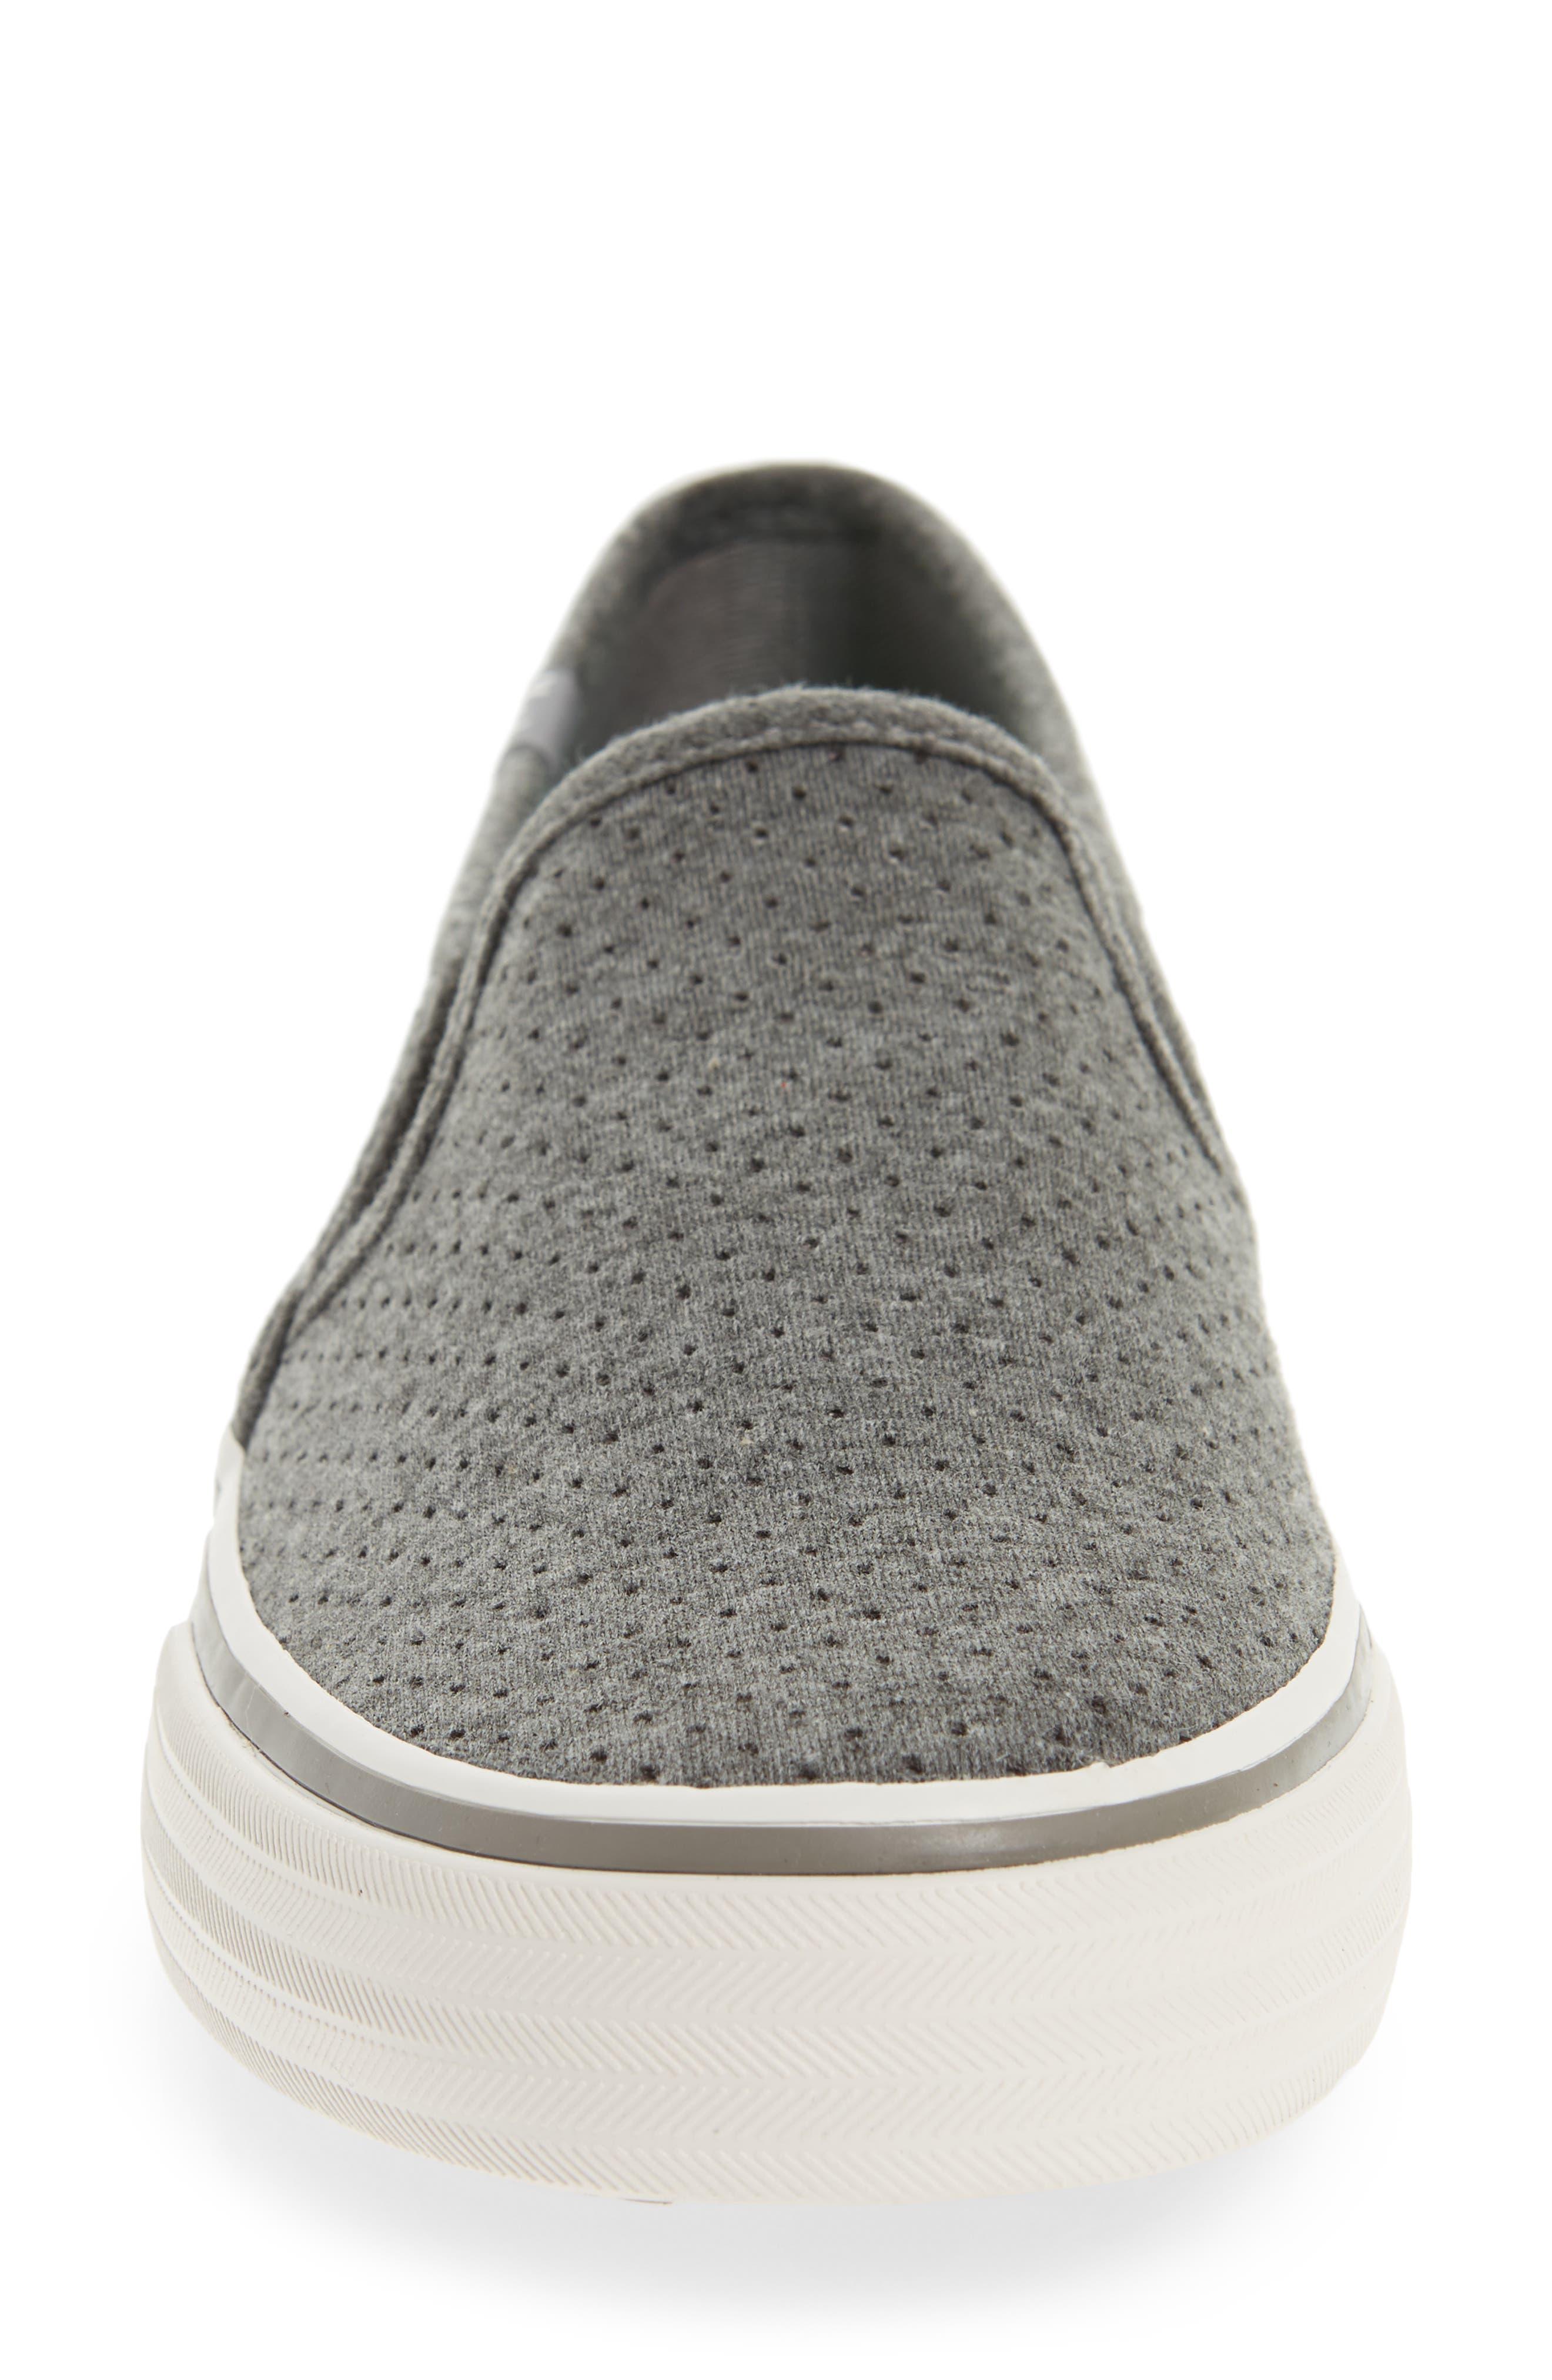 Double Decker Perforated Slip-On Sneaker,                             Alternate thumbnail 4, color,                             021